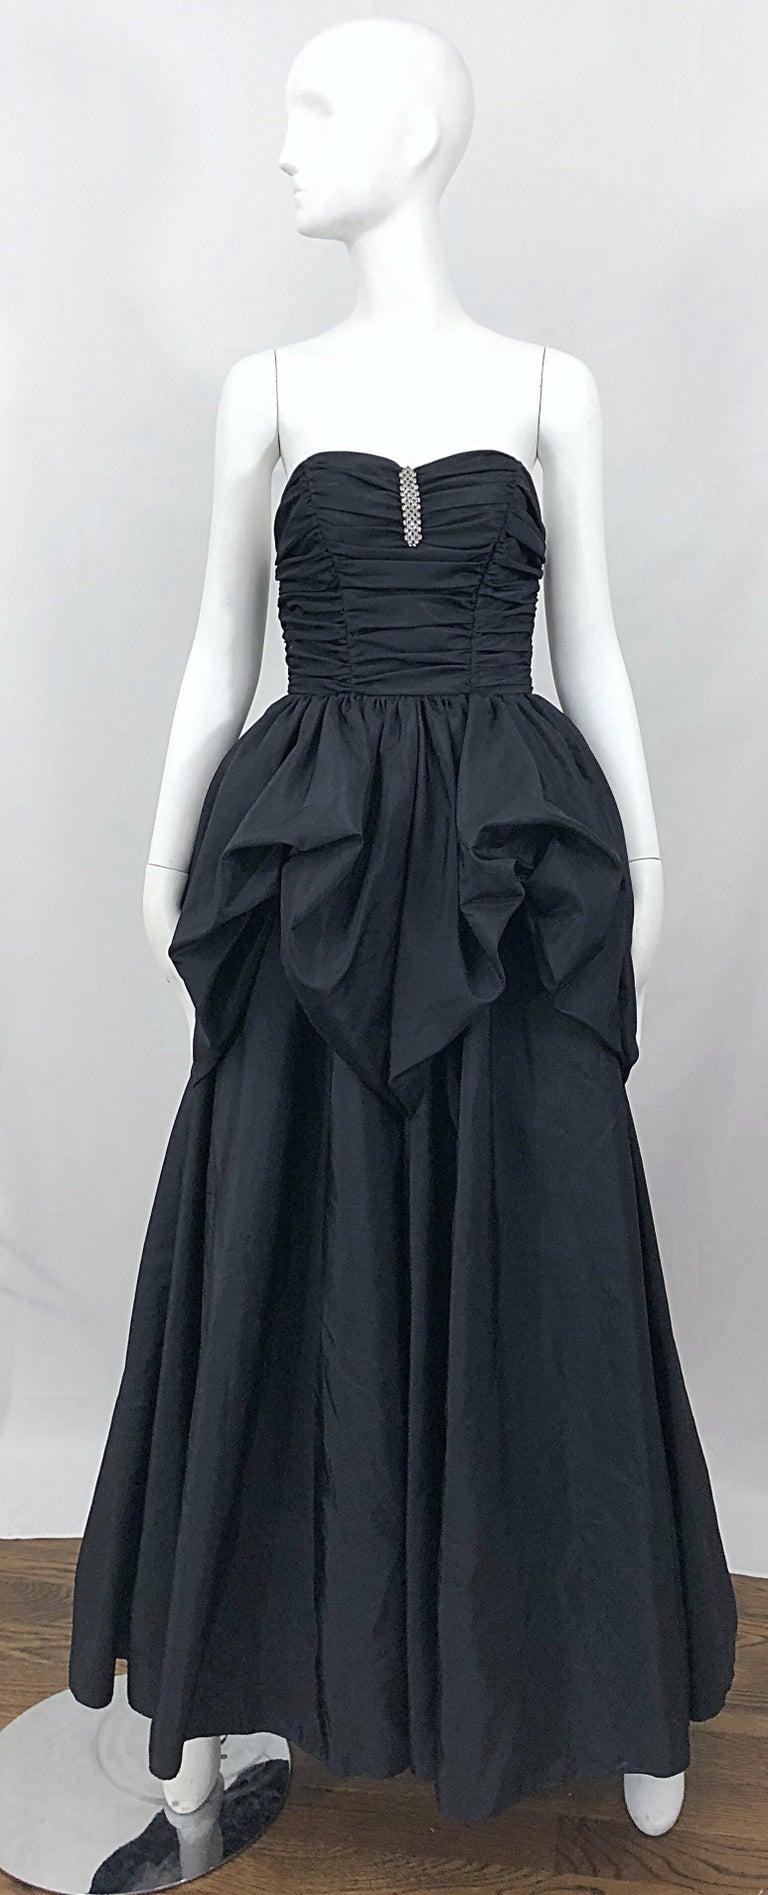 067d4e3c4358 Fabulous vintage 80s MIKE BENET black taffeta strapless bustle gown!  Features a ruched boned bodice